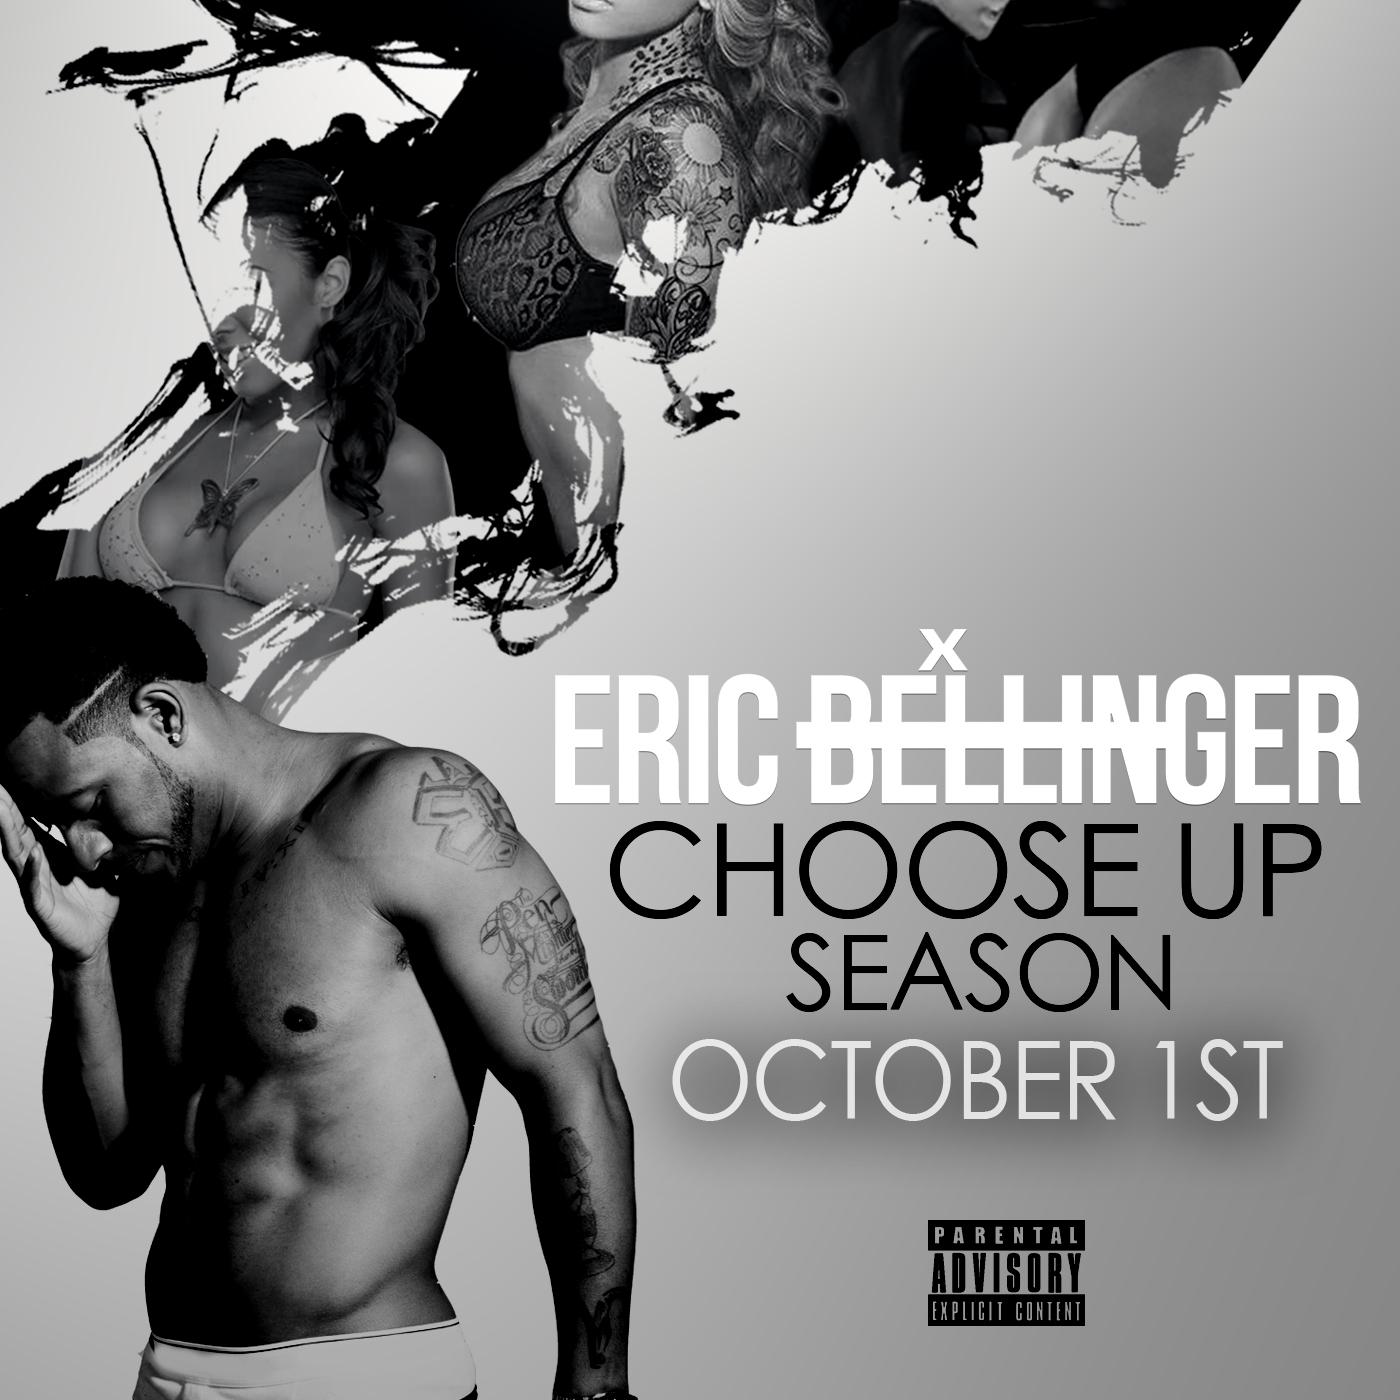 Eric Bellinger Choose Up Season